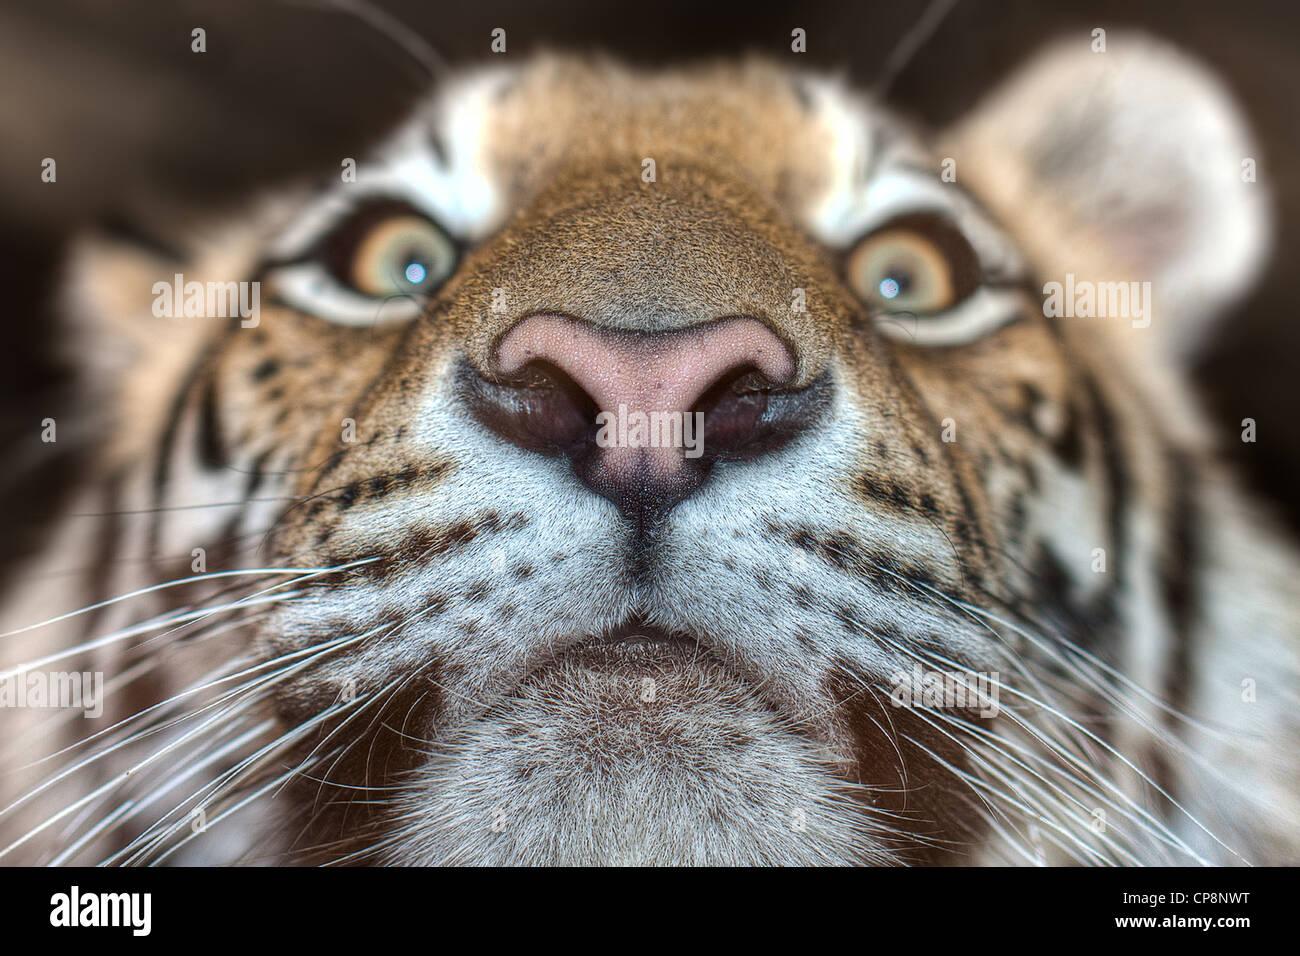 tiger breath stockfotos tiger breath bilder alamy. Black Bedroom Furniture Sets. Home Design Ideas